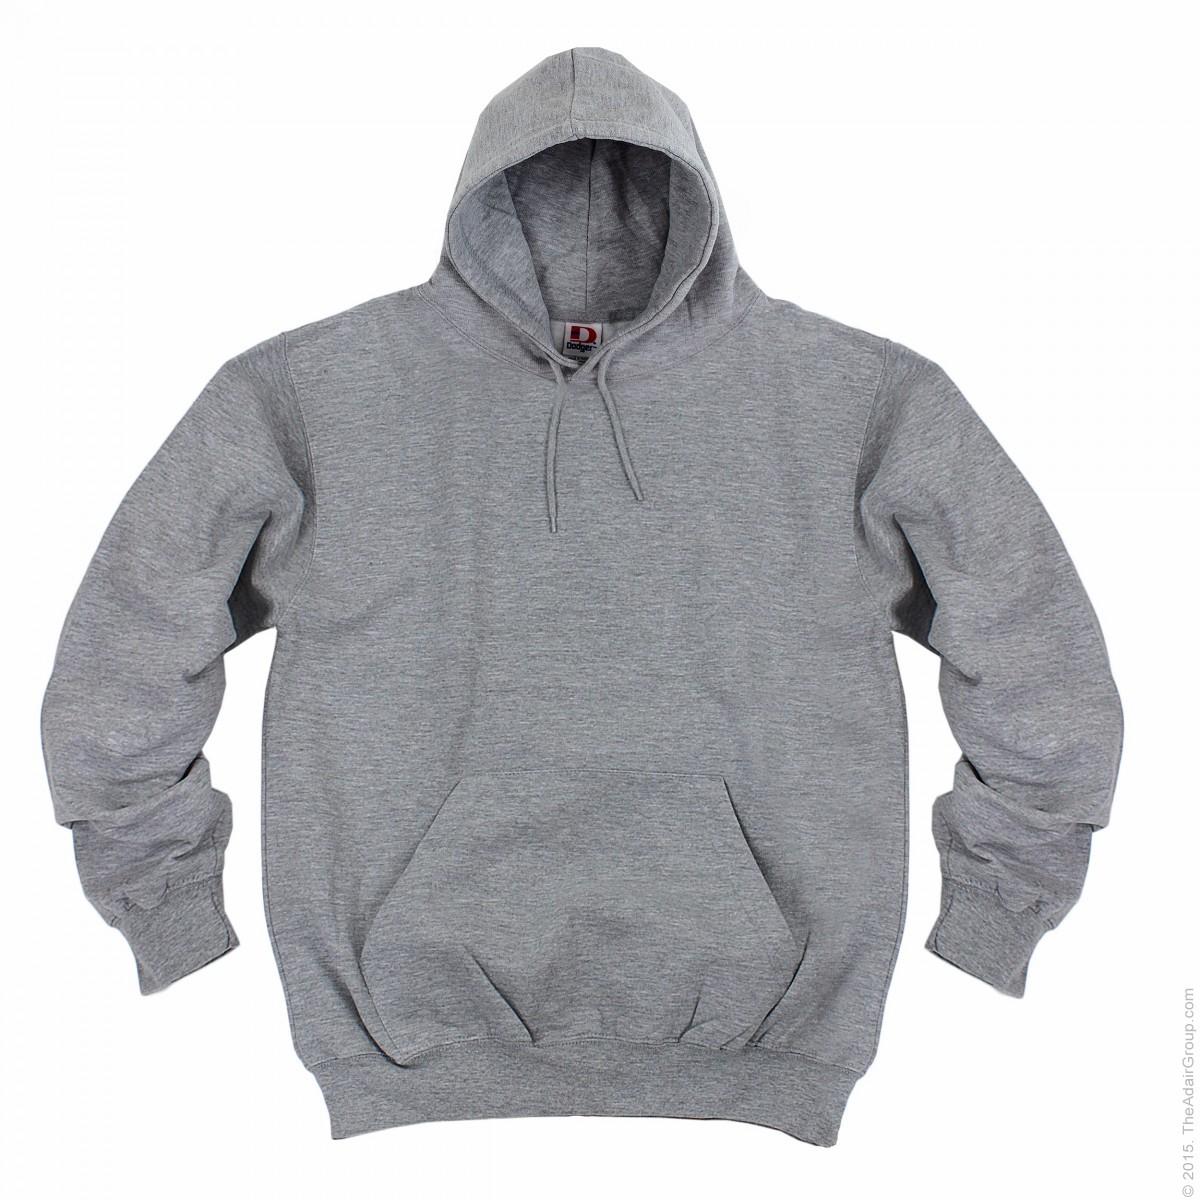 3327e47c427a Where To Buy Blank Sweatshirts - DREAMWORKS